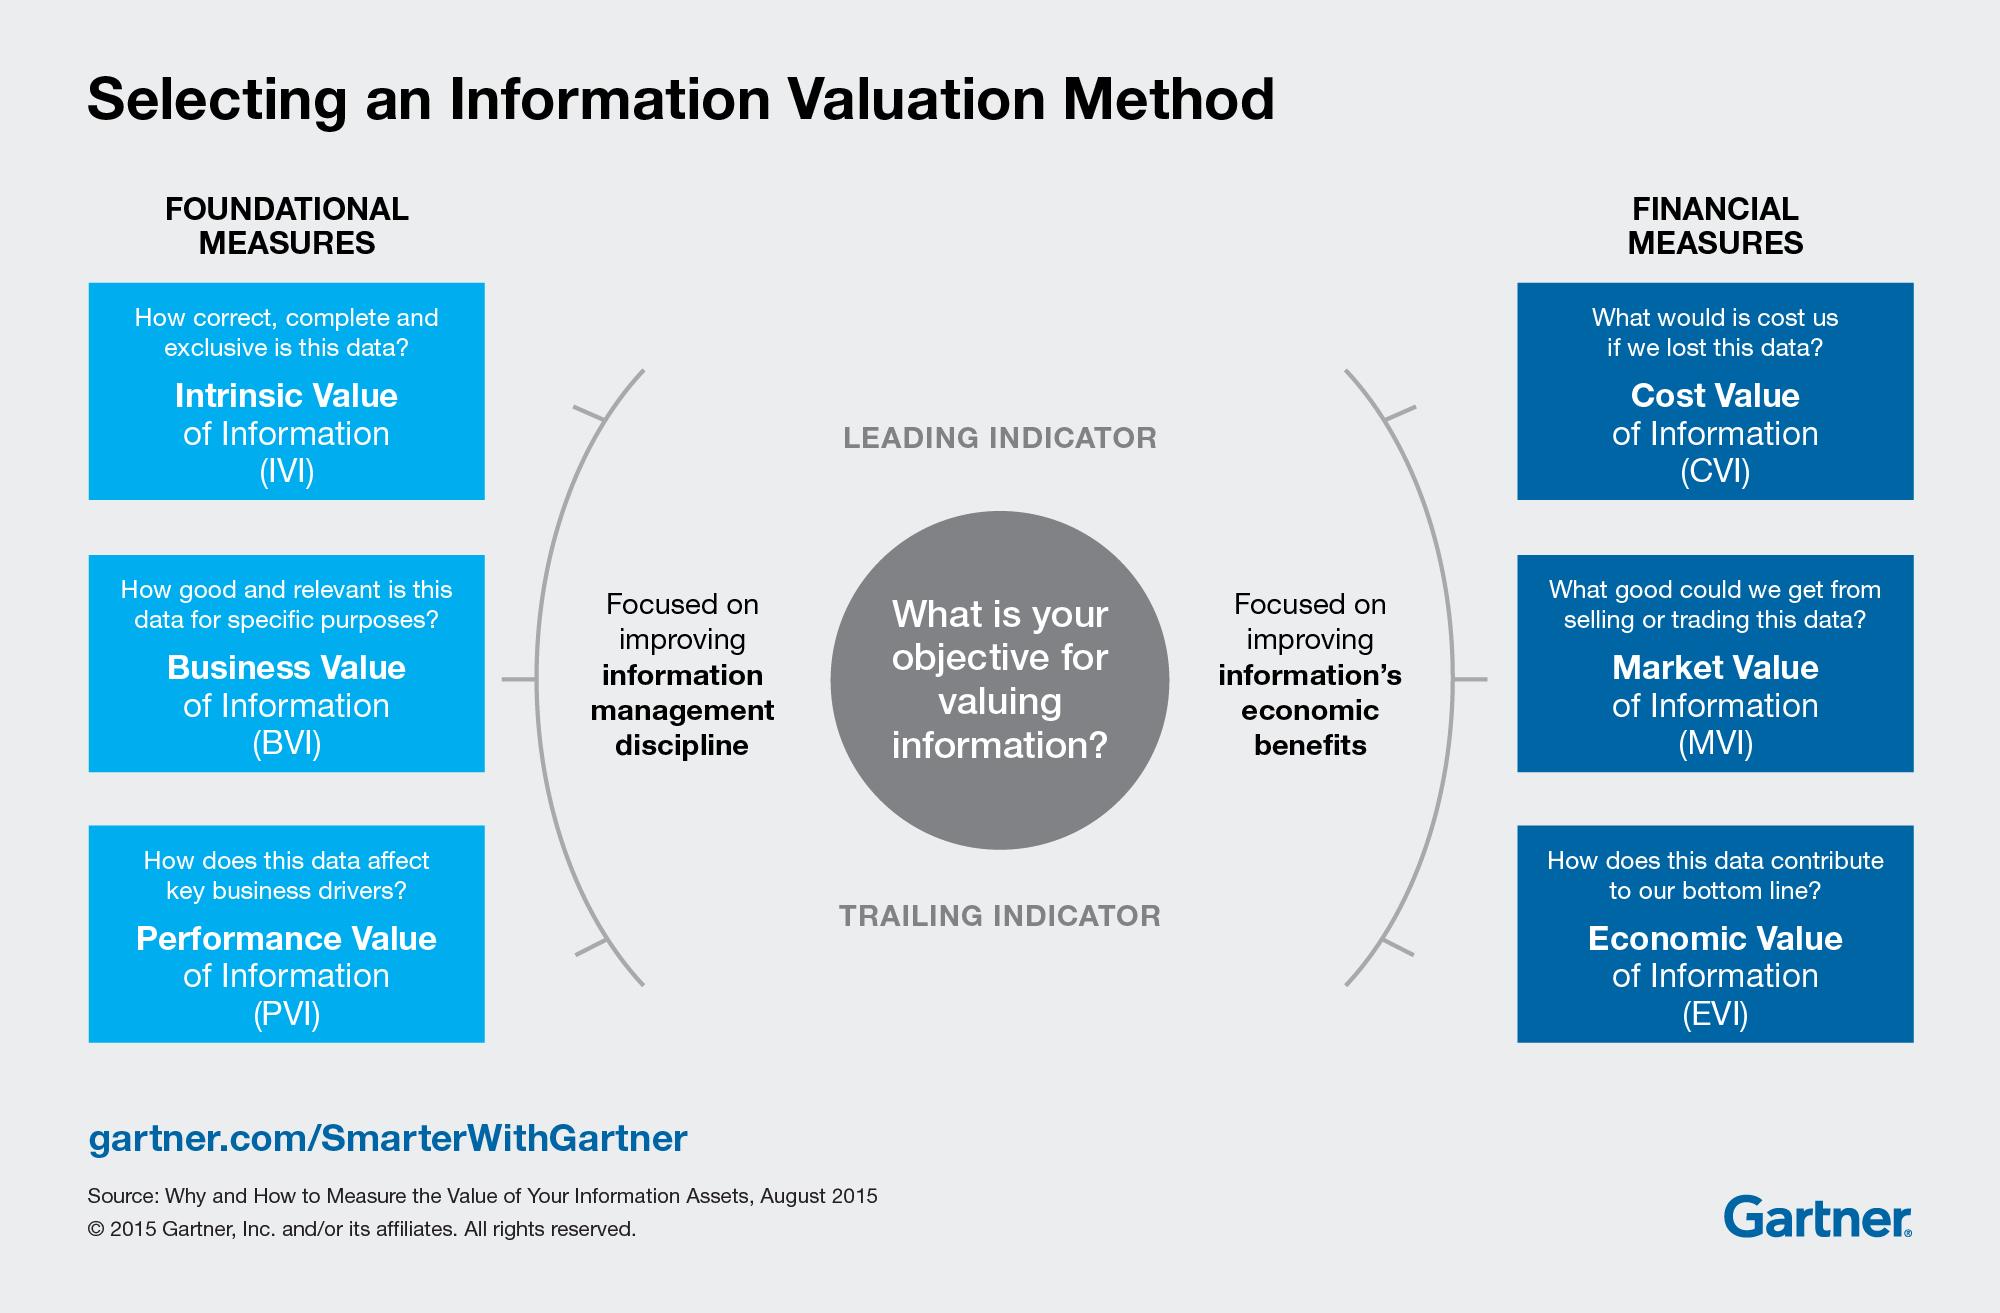 ValuationMethod